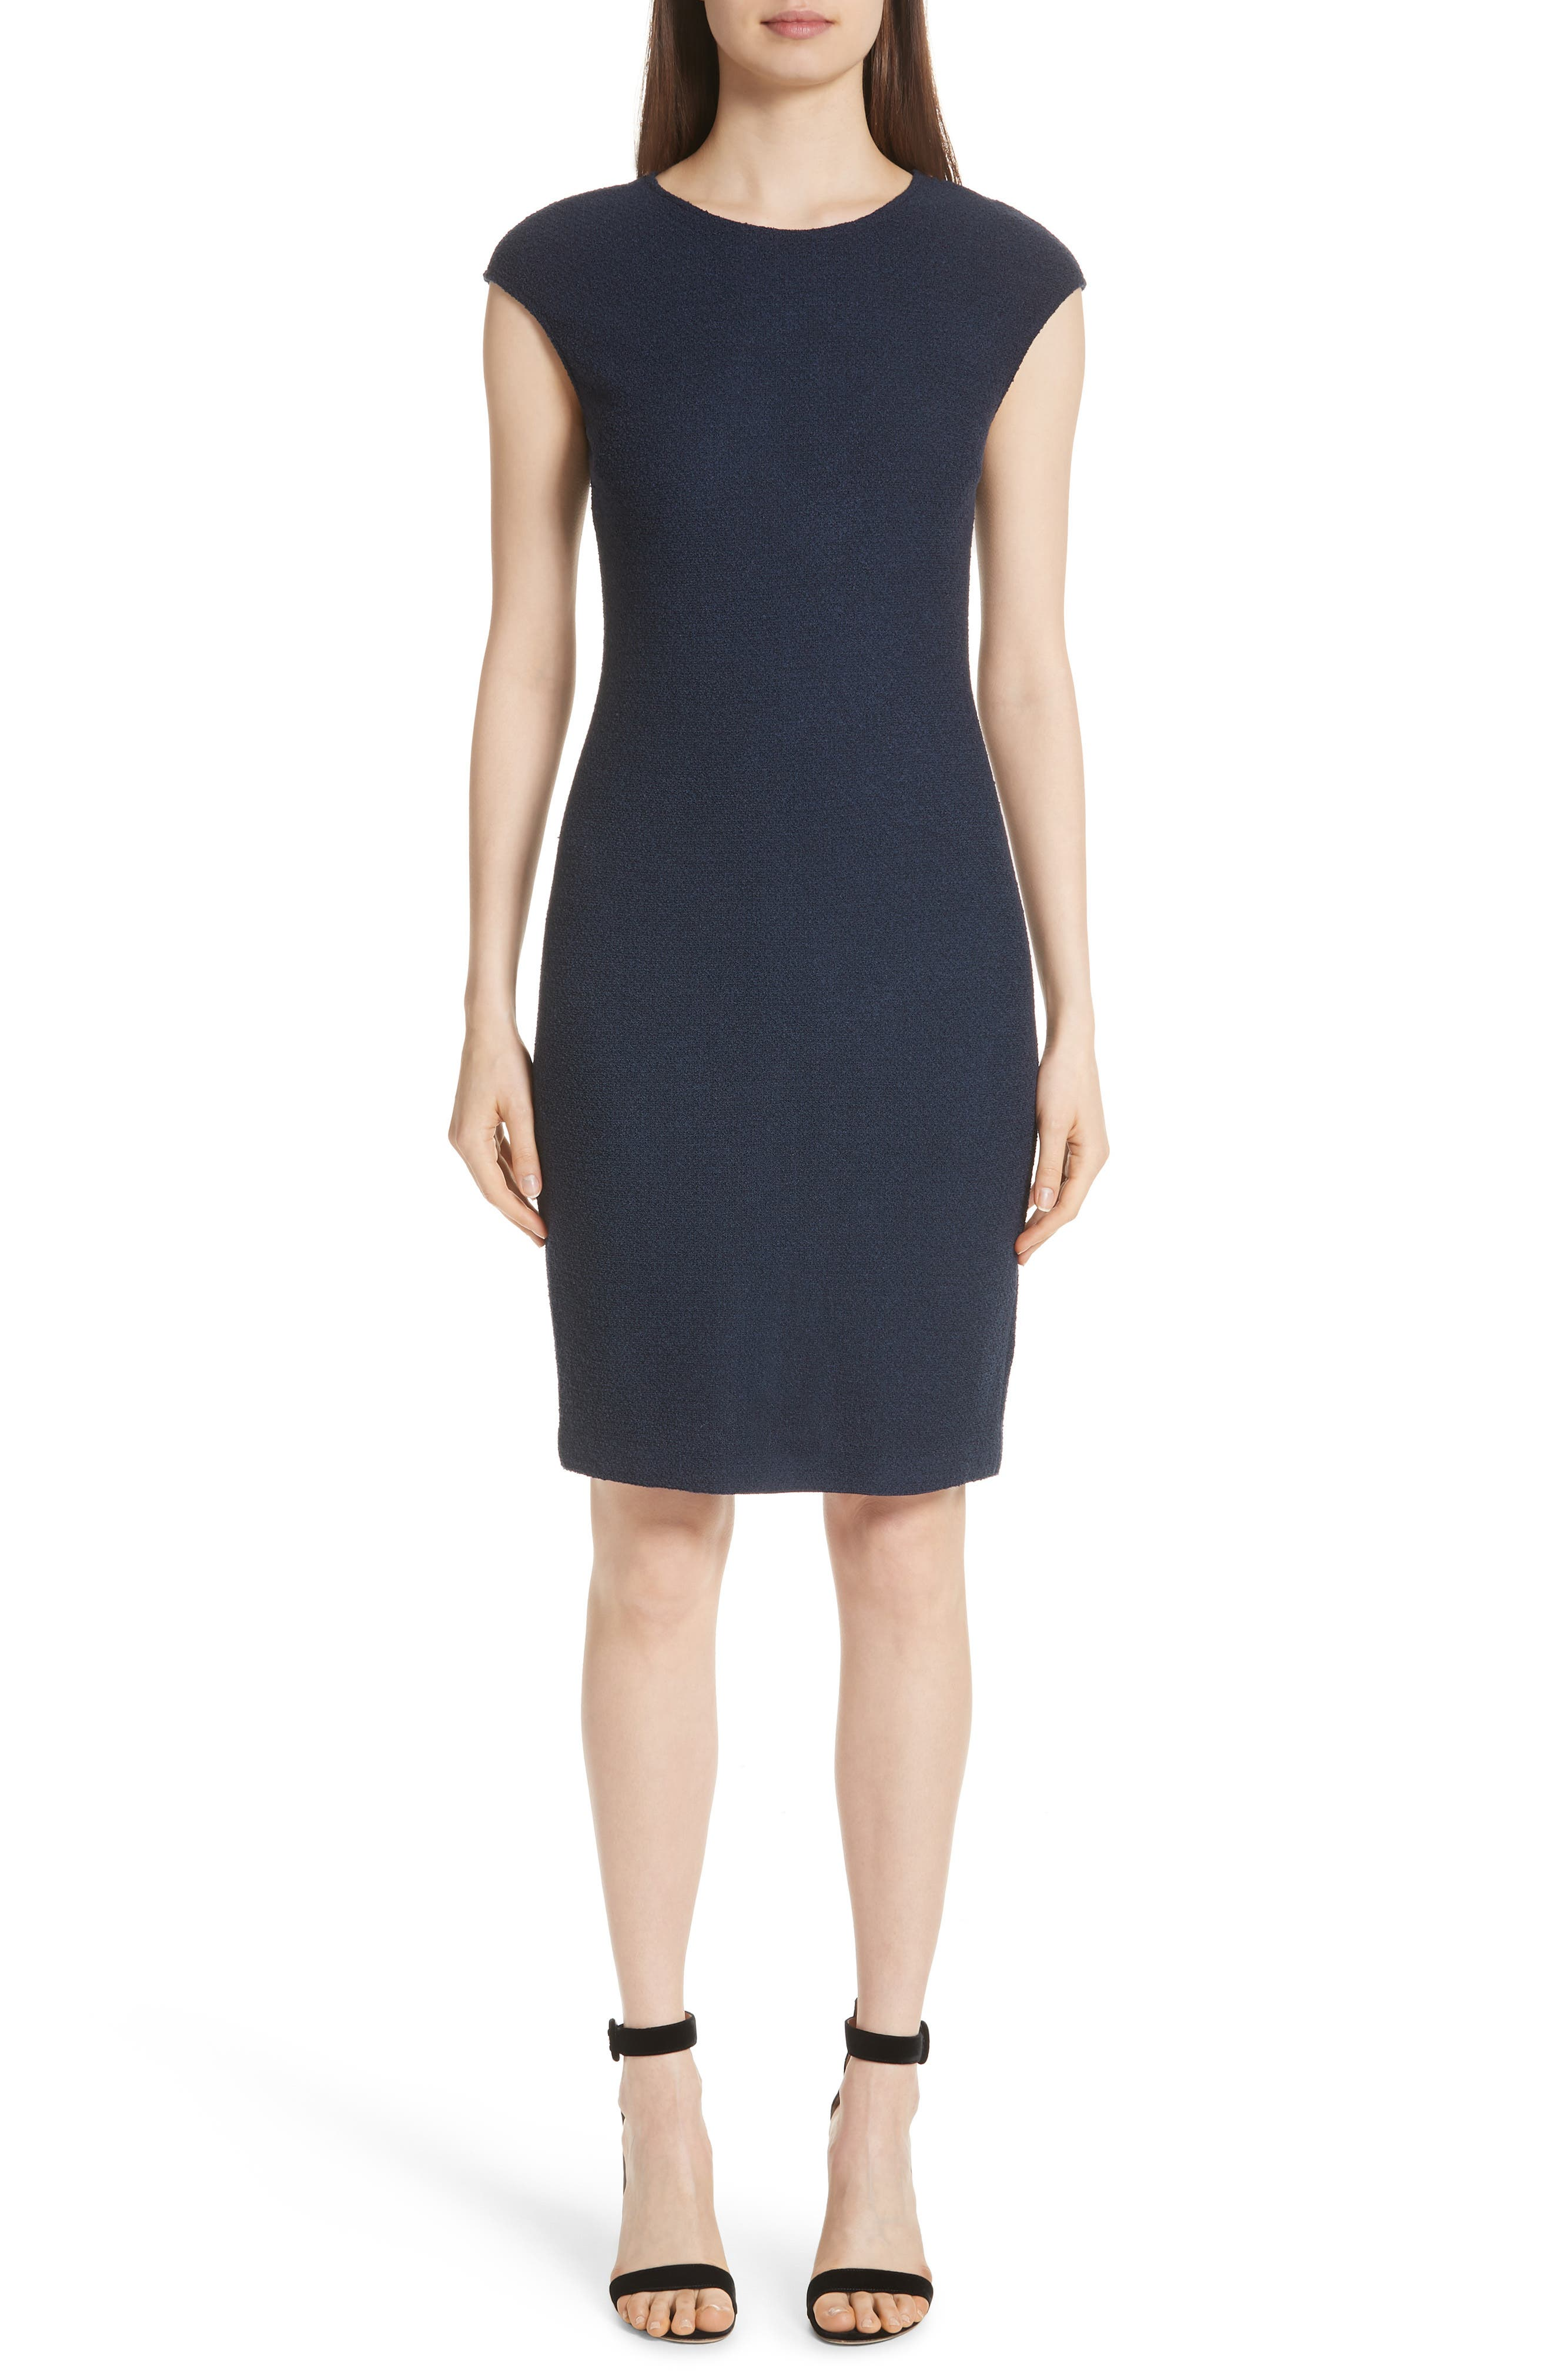 Ana Cap-Sleeve Boucle Knit Sheath Dress in Deep Blue